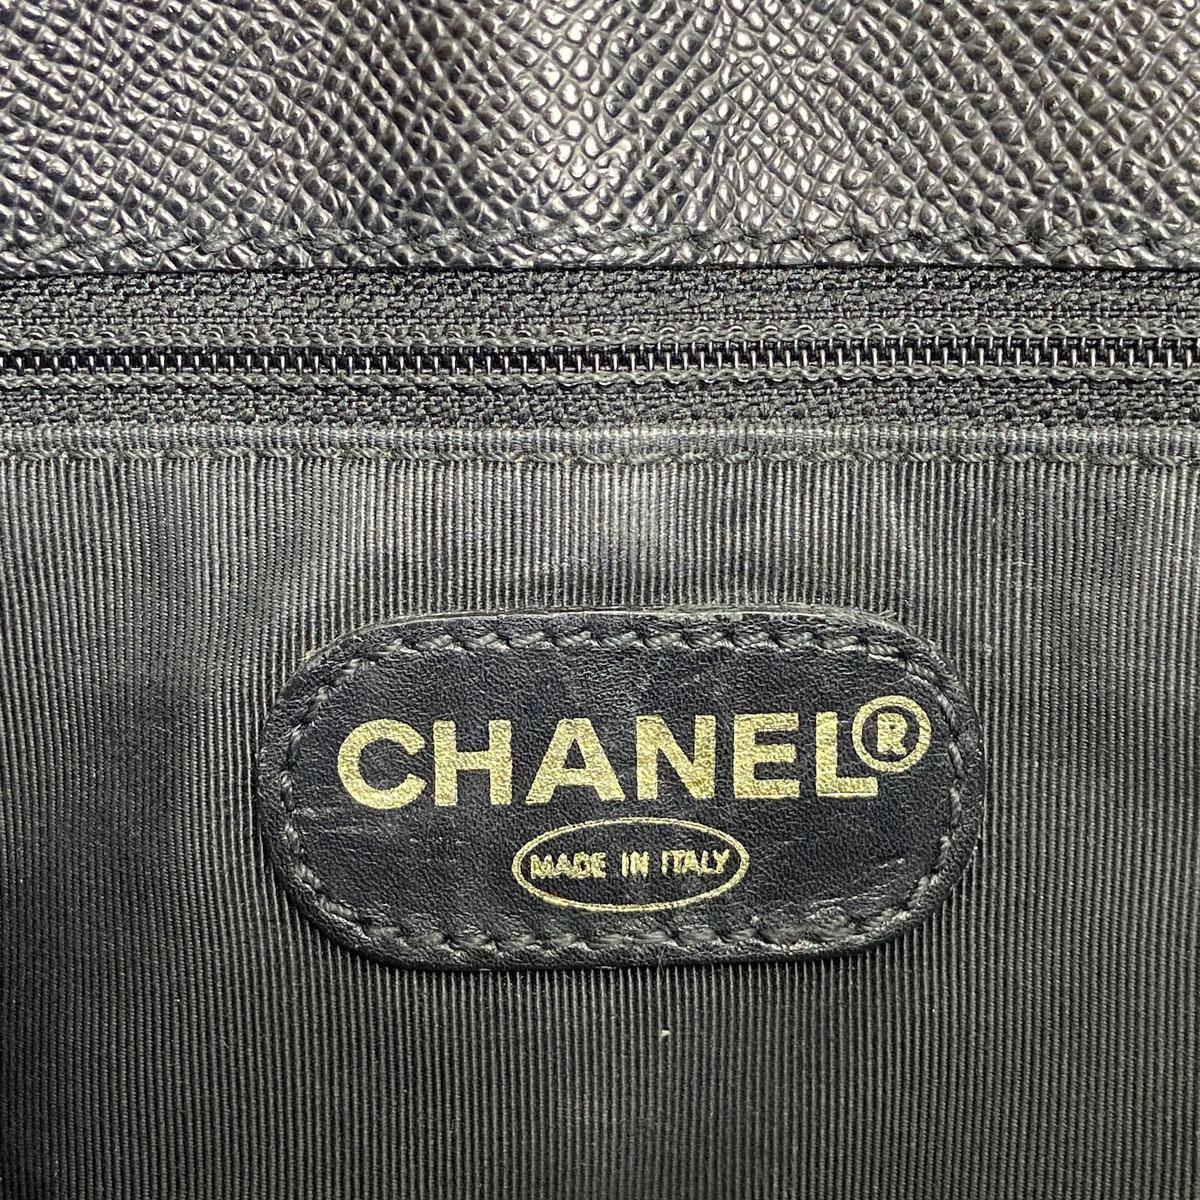 CHANEL シャネル トートバッグ キャビアスキン ブラック 5番台(1998年頃製造)